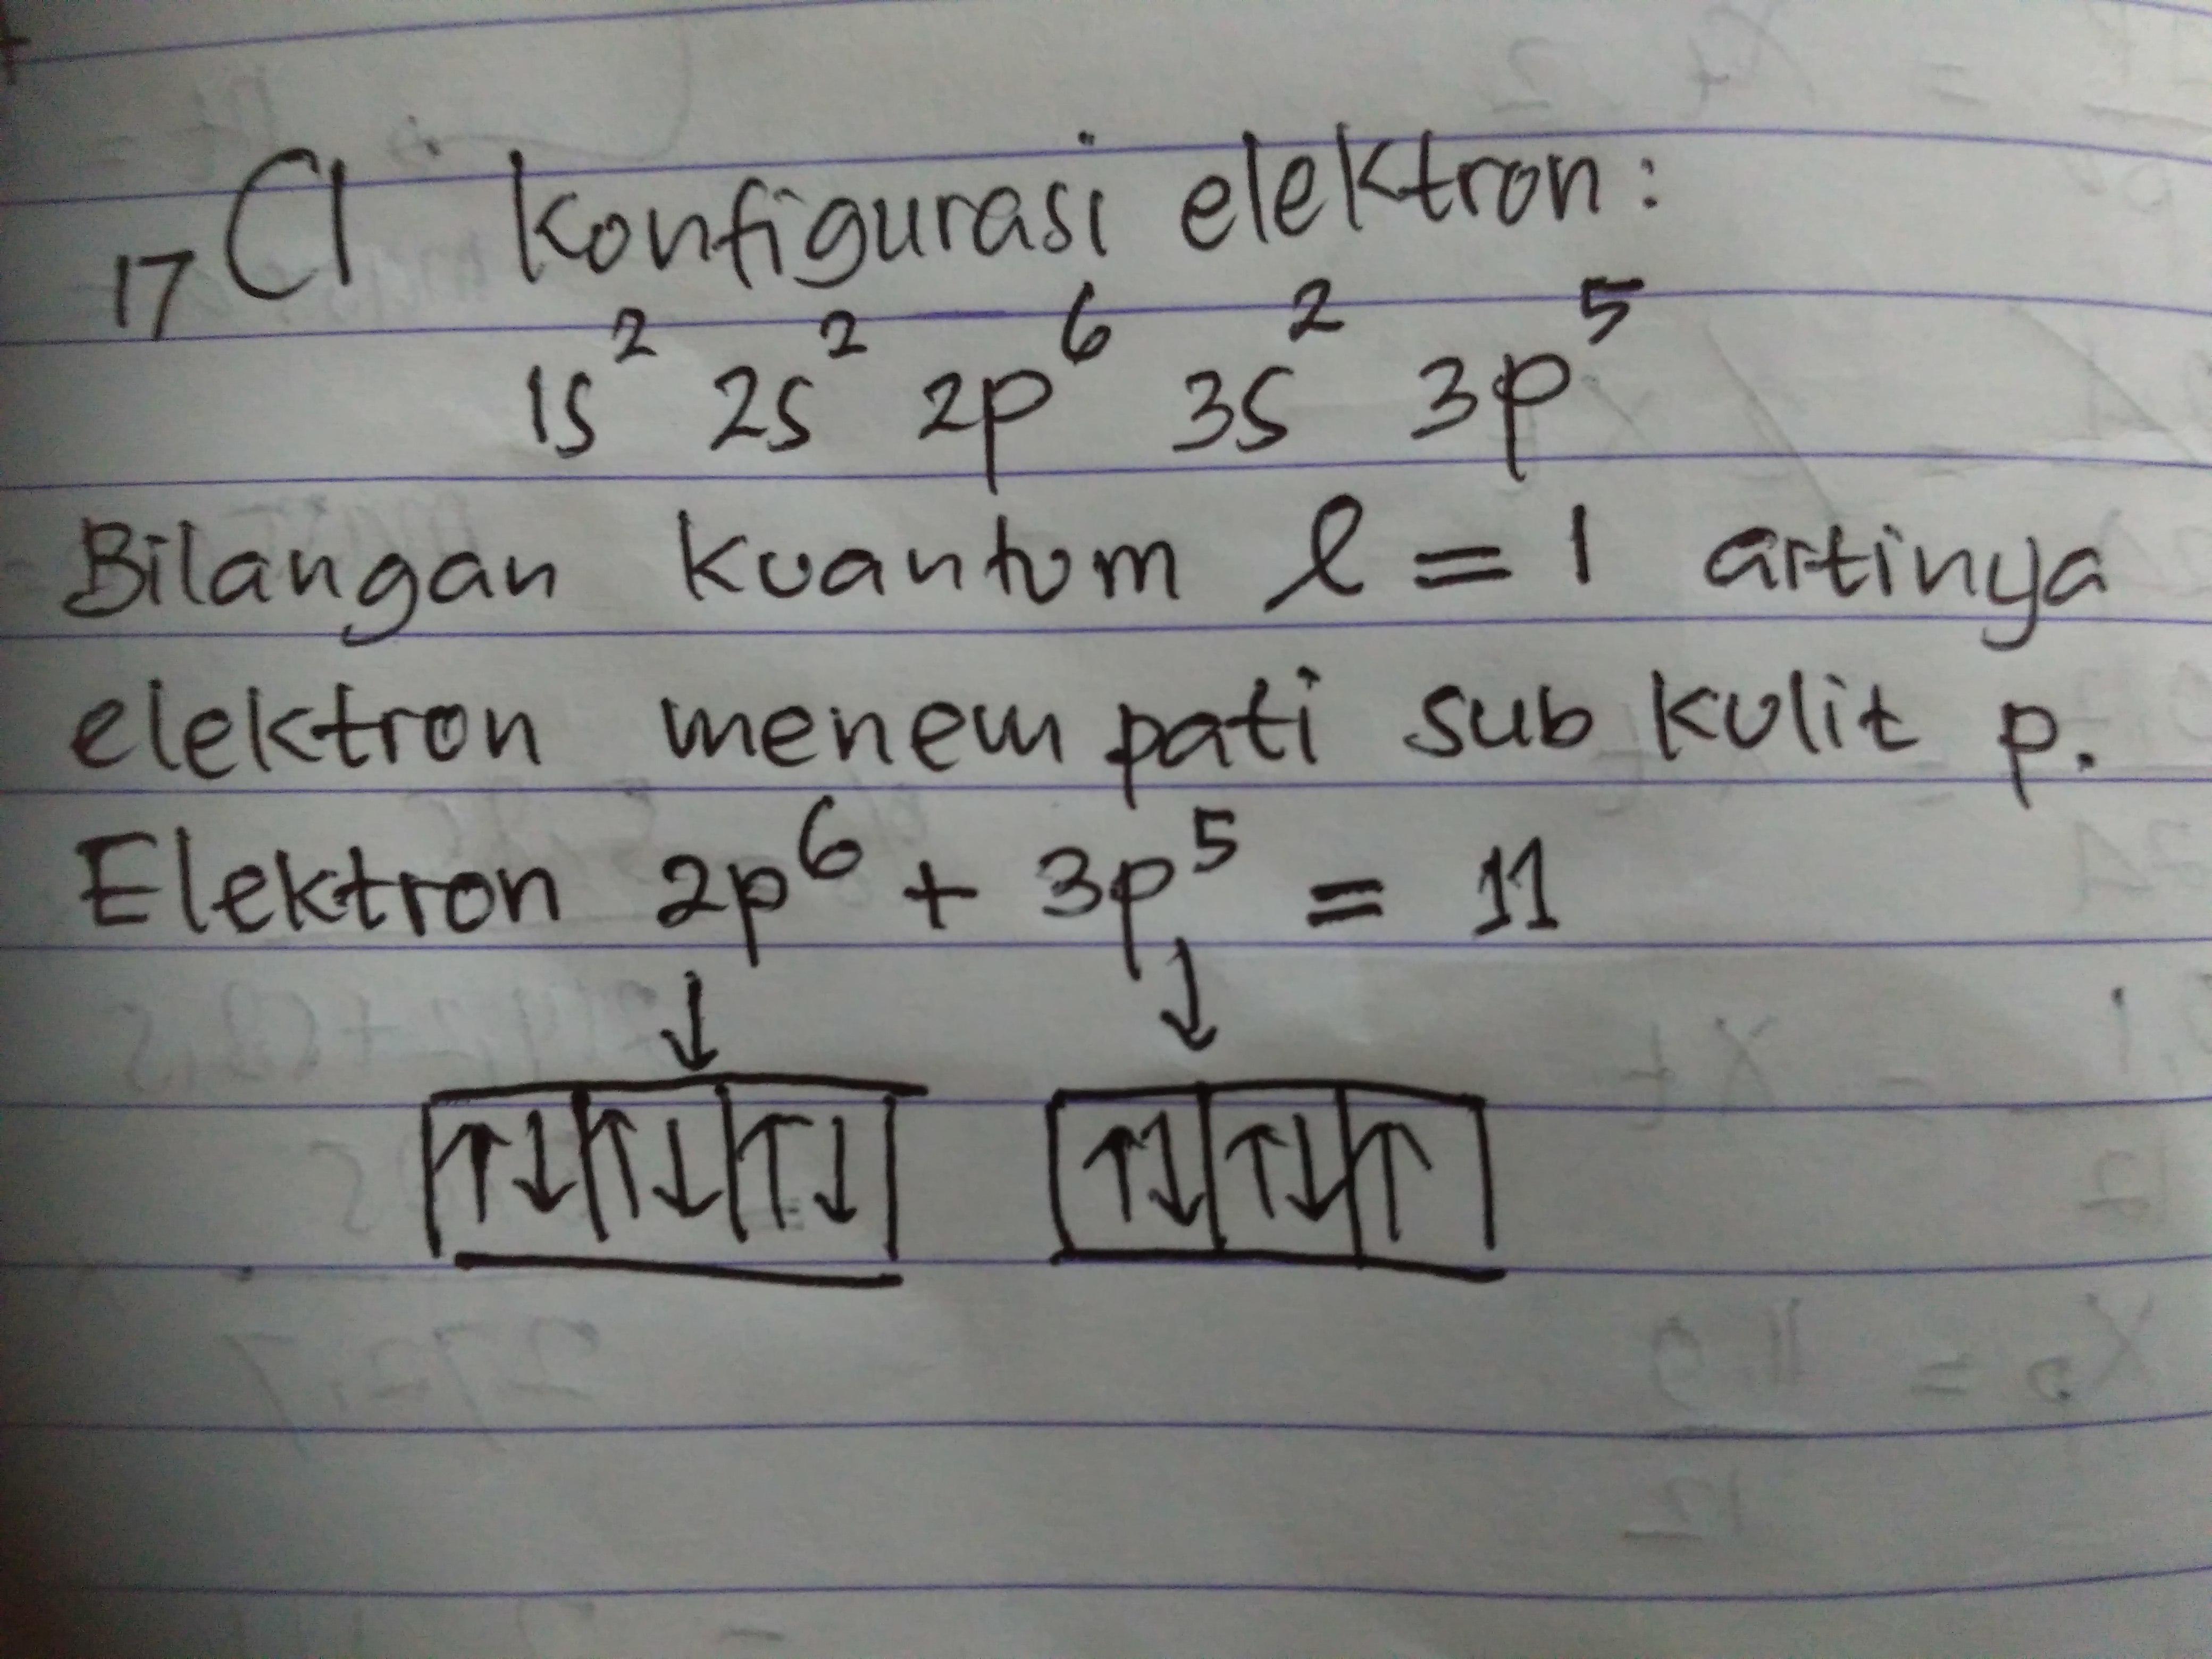 elektron dalam atom 17CI yang memiliki bilangan kuantum l ...